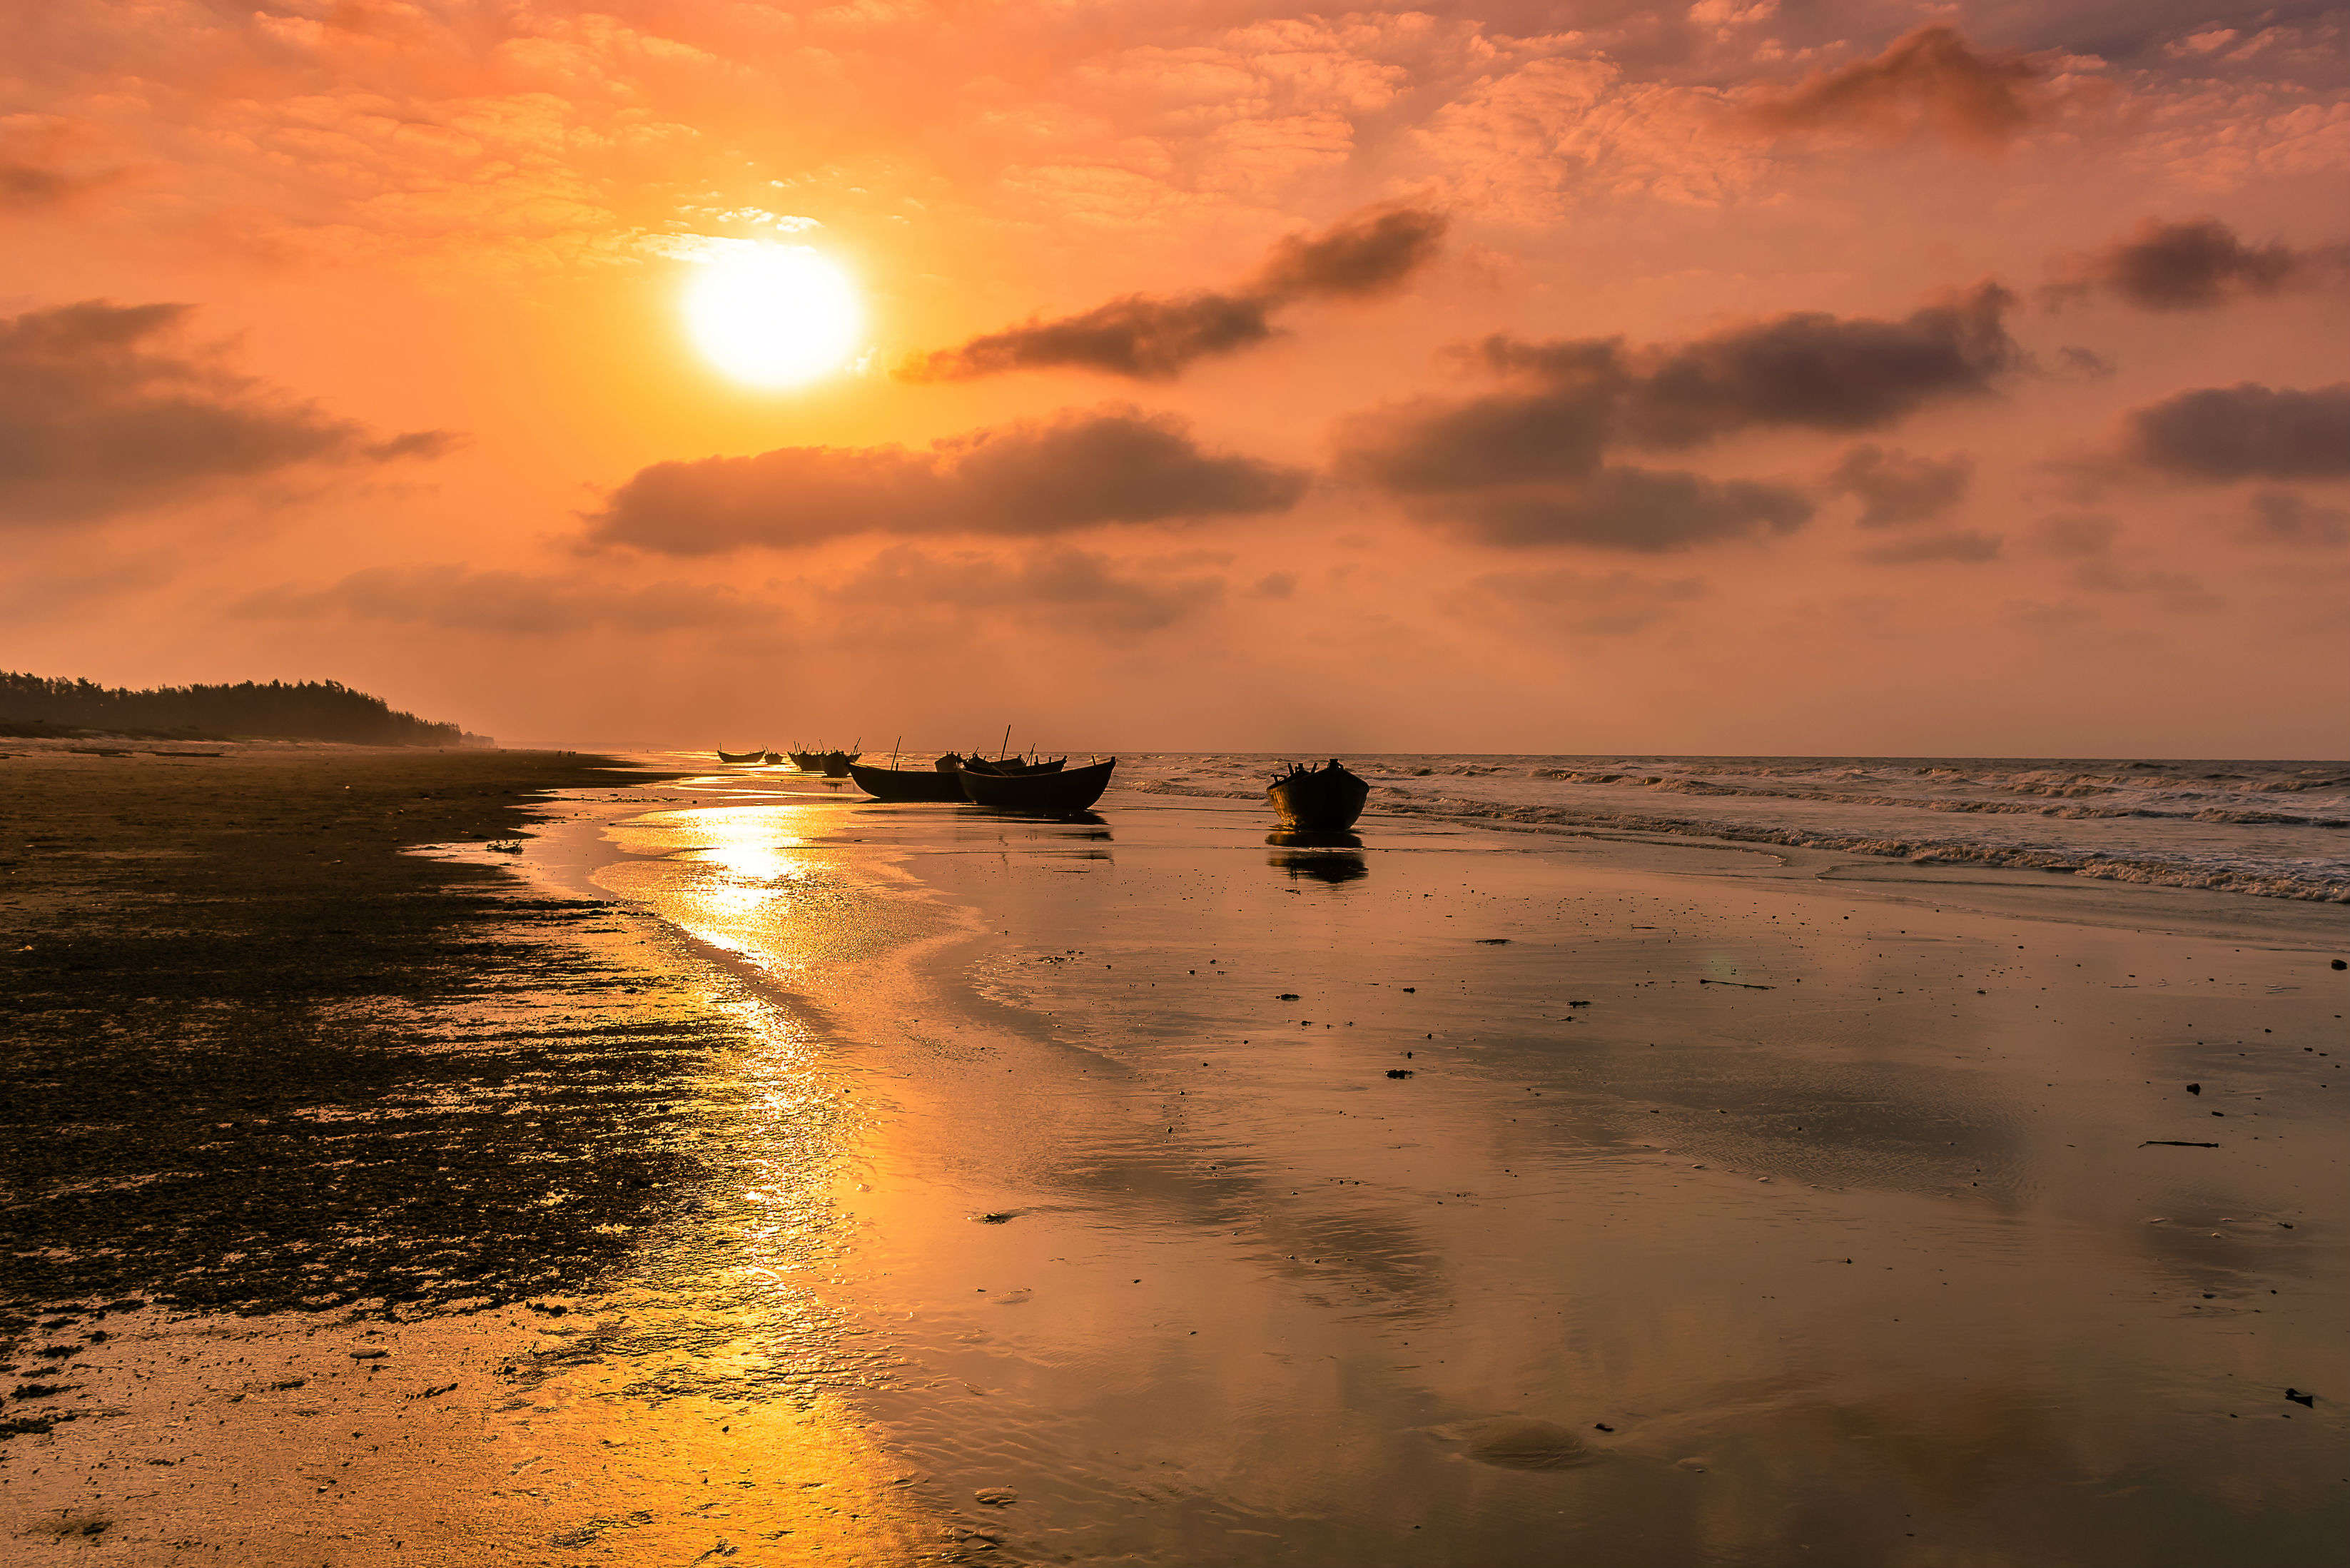 Shankarpur beach town is the perfect romantic getaway from Kolkata